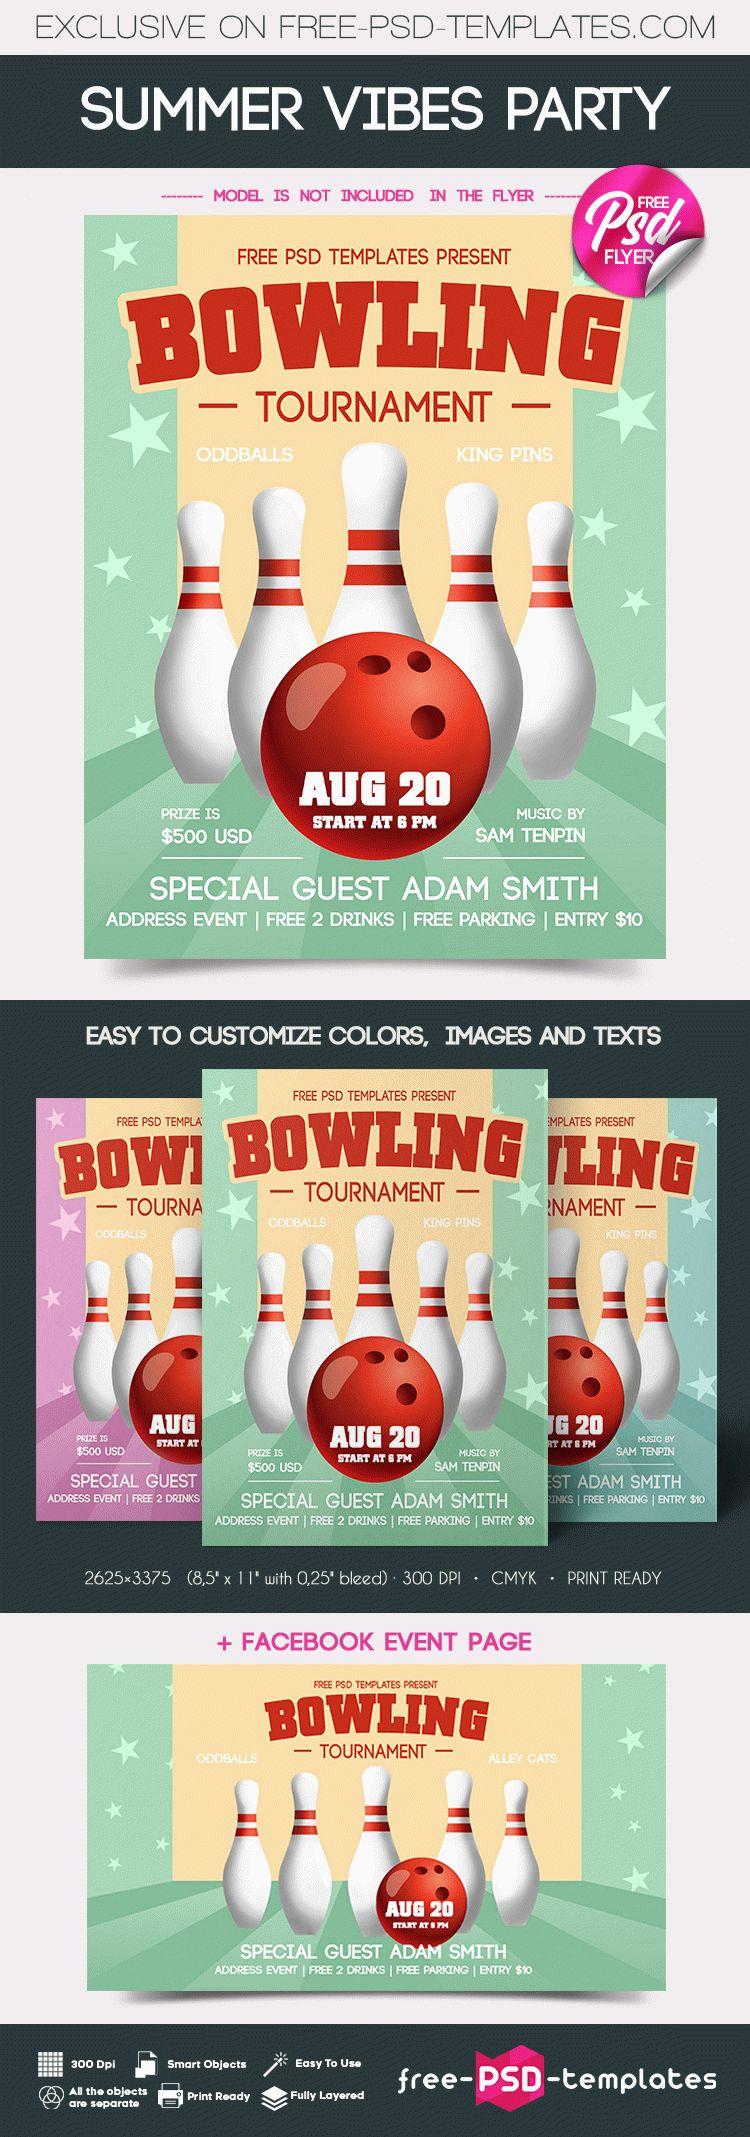 Free Bowling Tournament Flyer Free Psd Templates